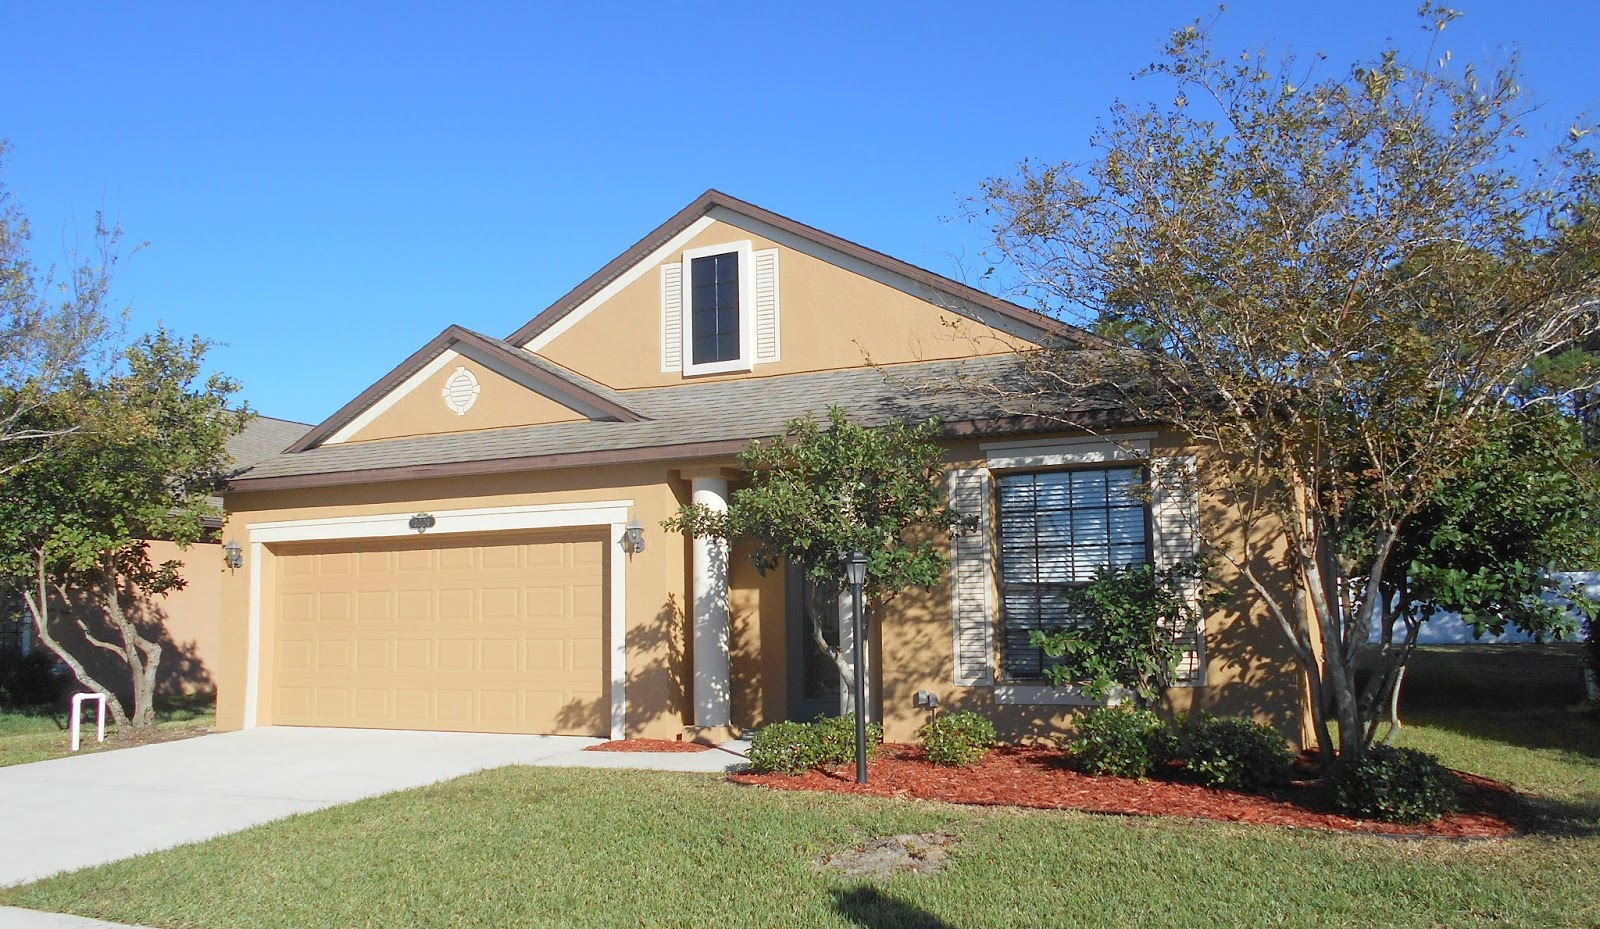 Florida homes for sale melbourne viera rockledge for 6 car garage homes for sale